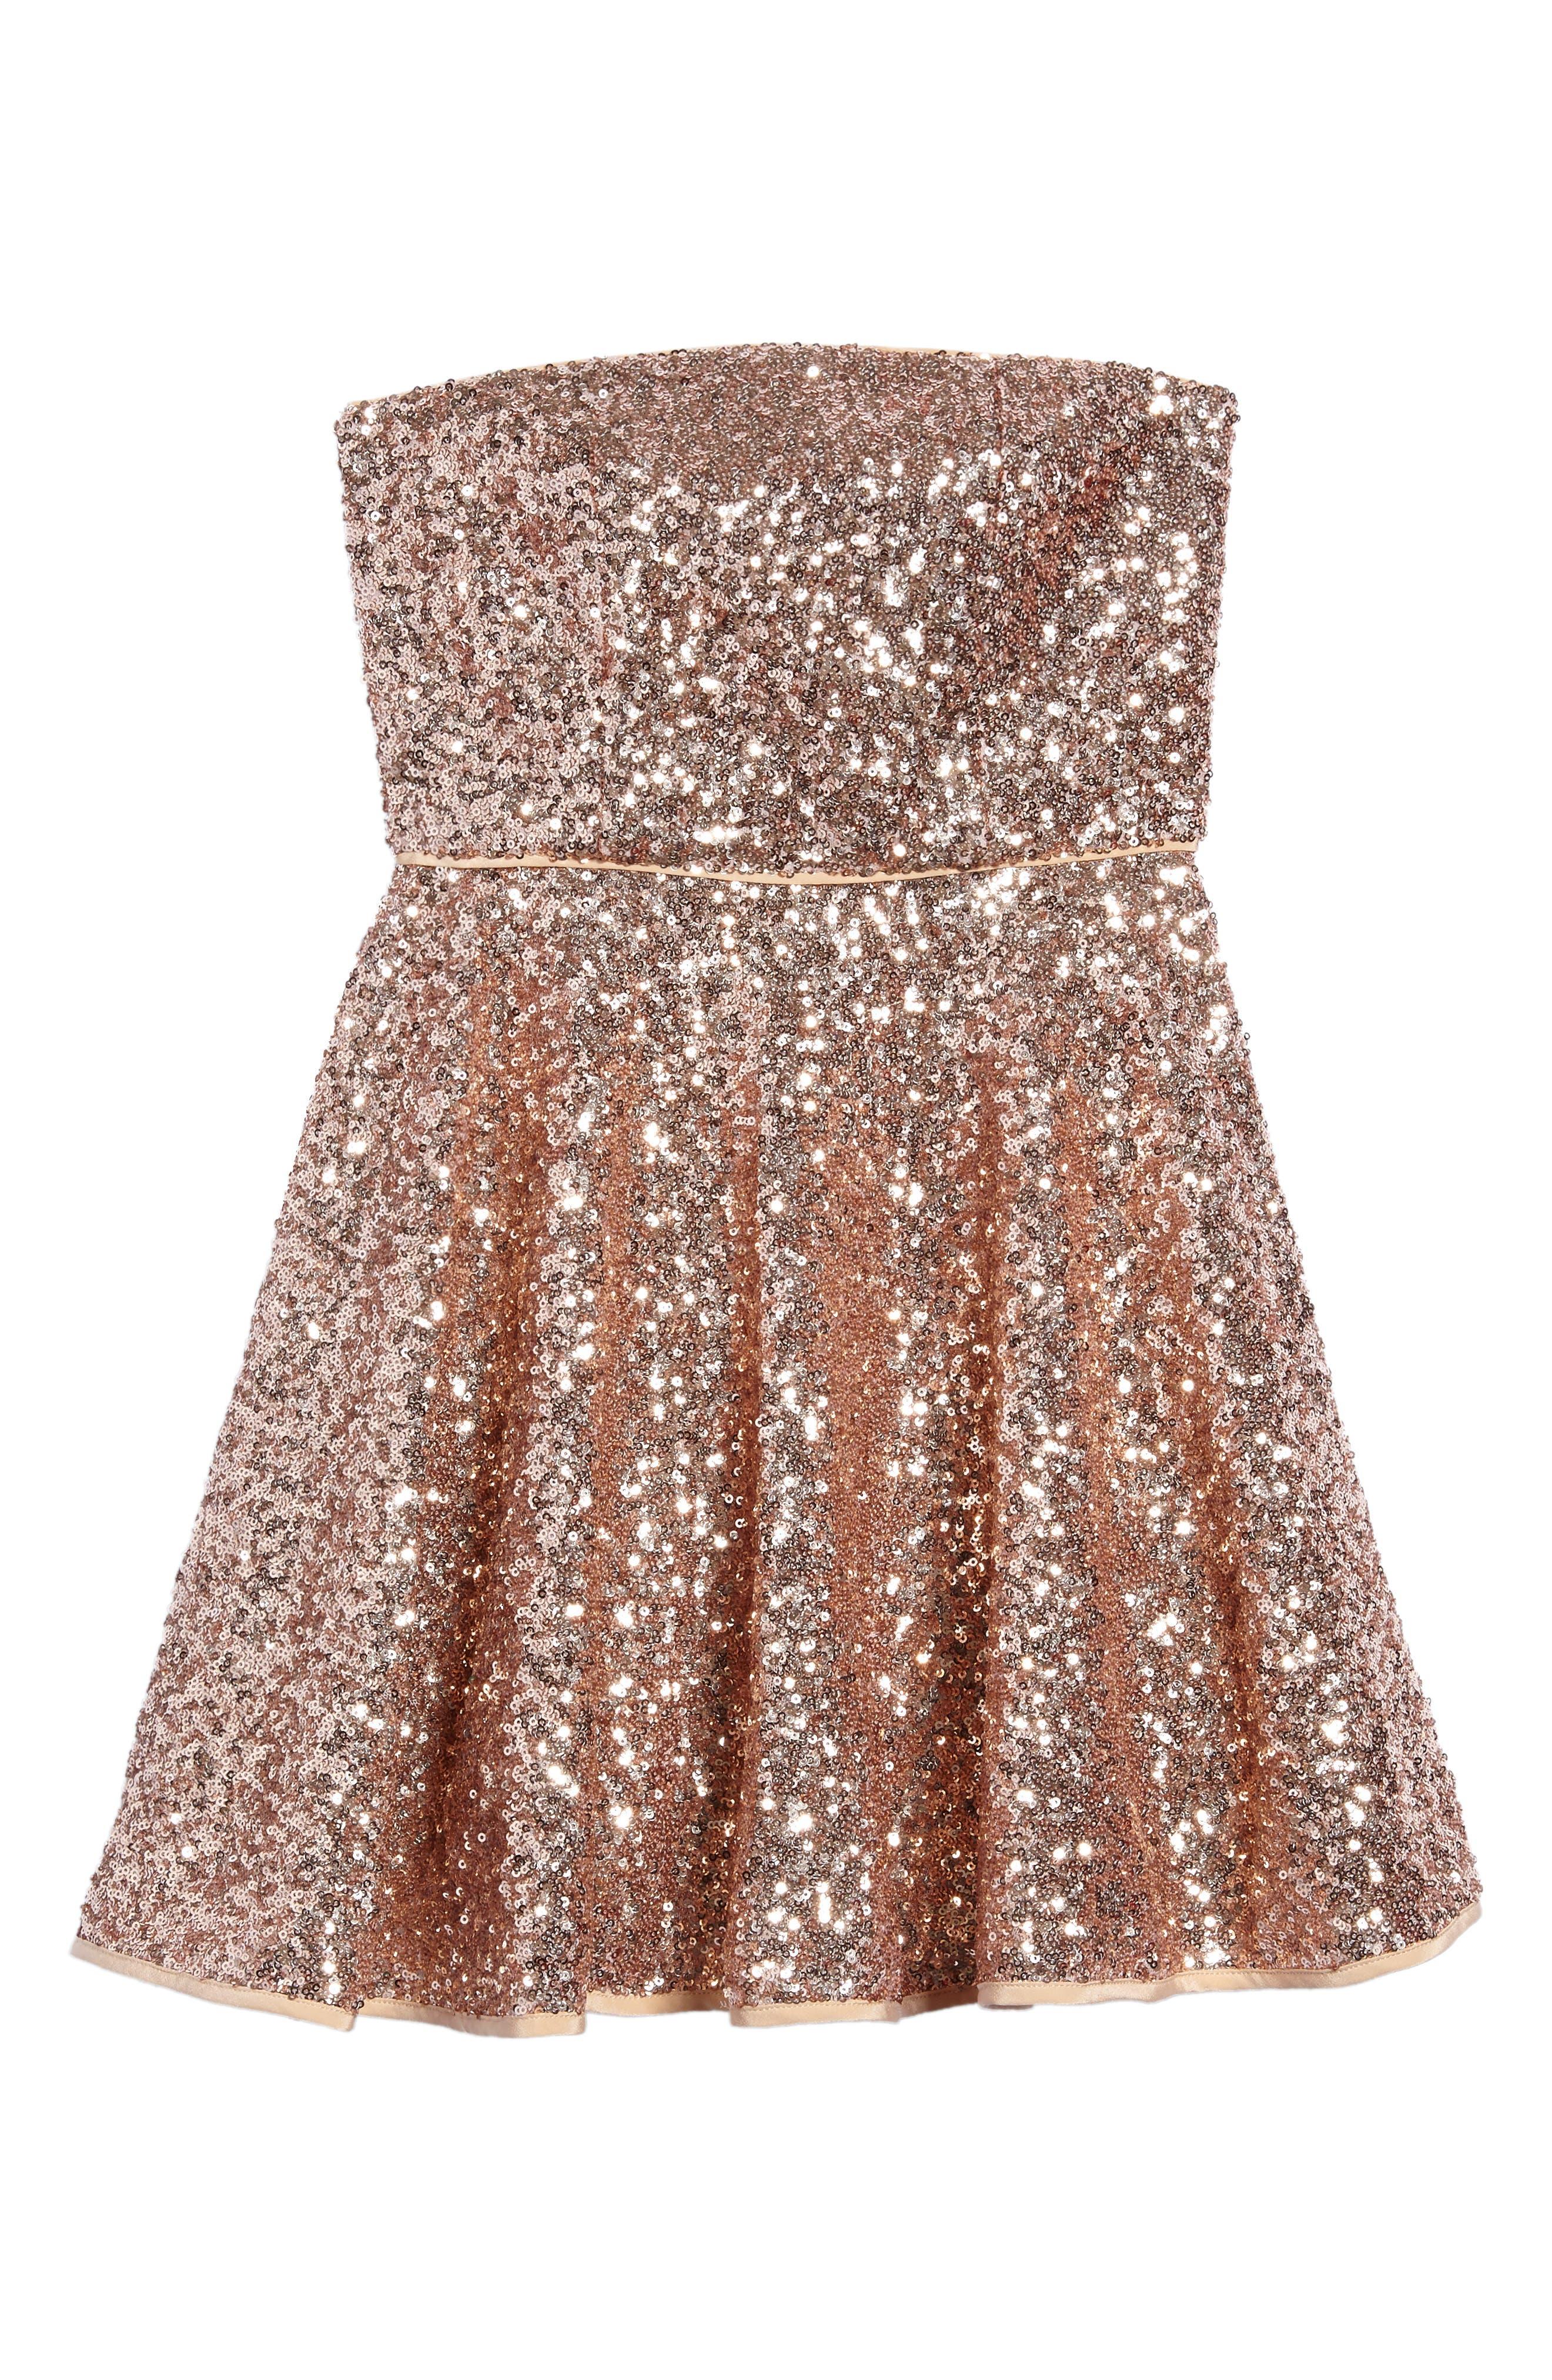 Main Image - Milly Minis Ellie Sequin Strapless Dress (Big Girls)